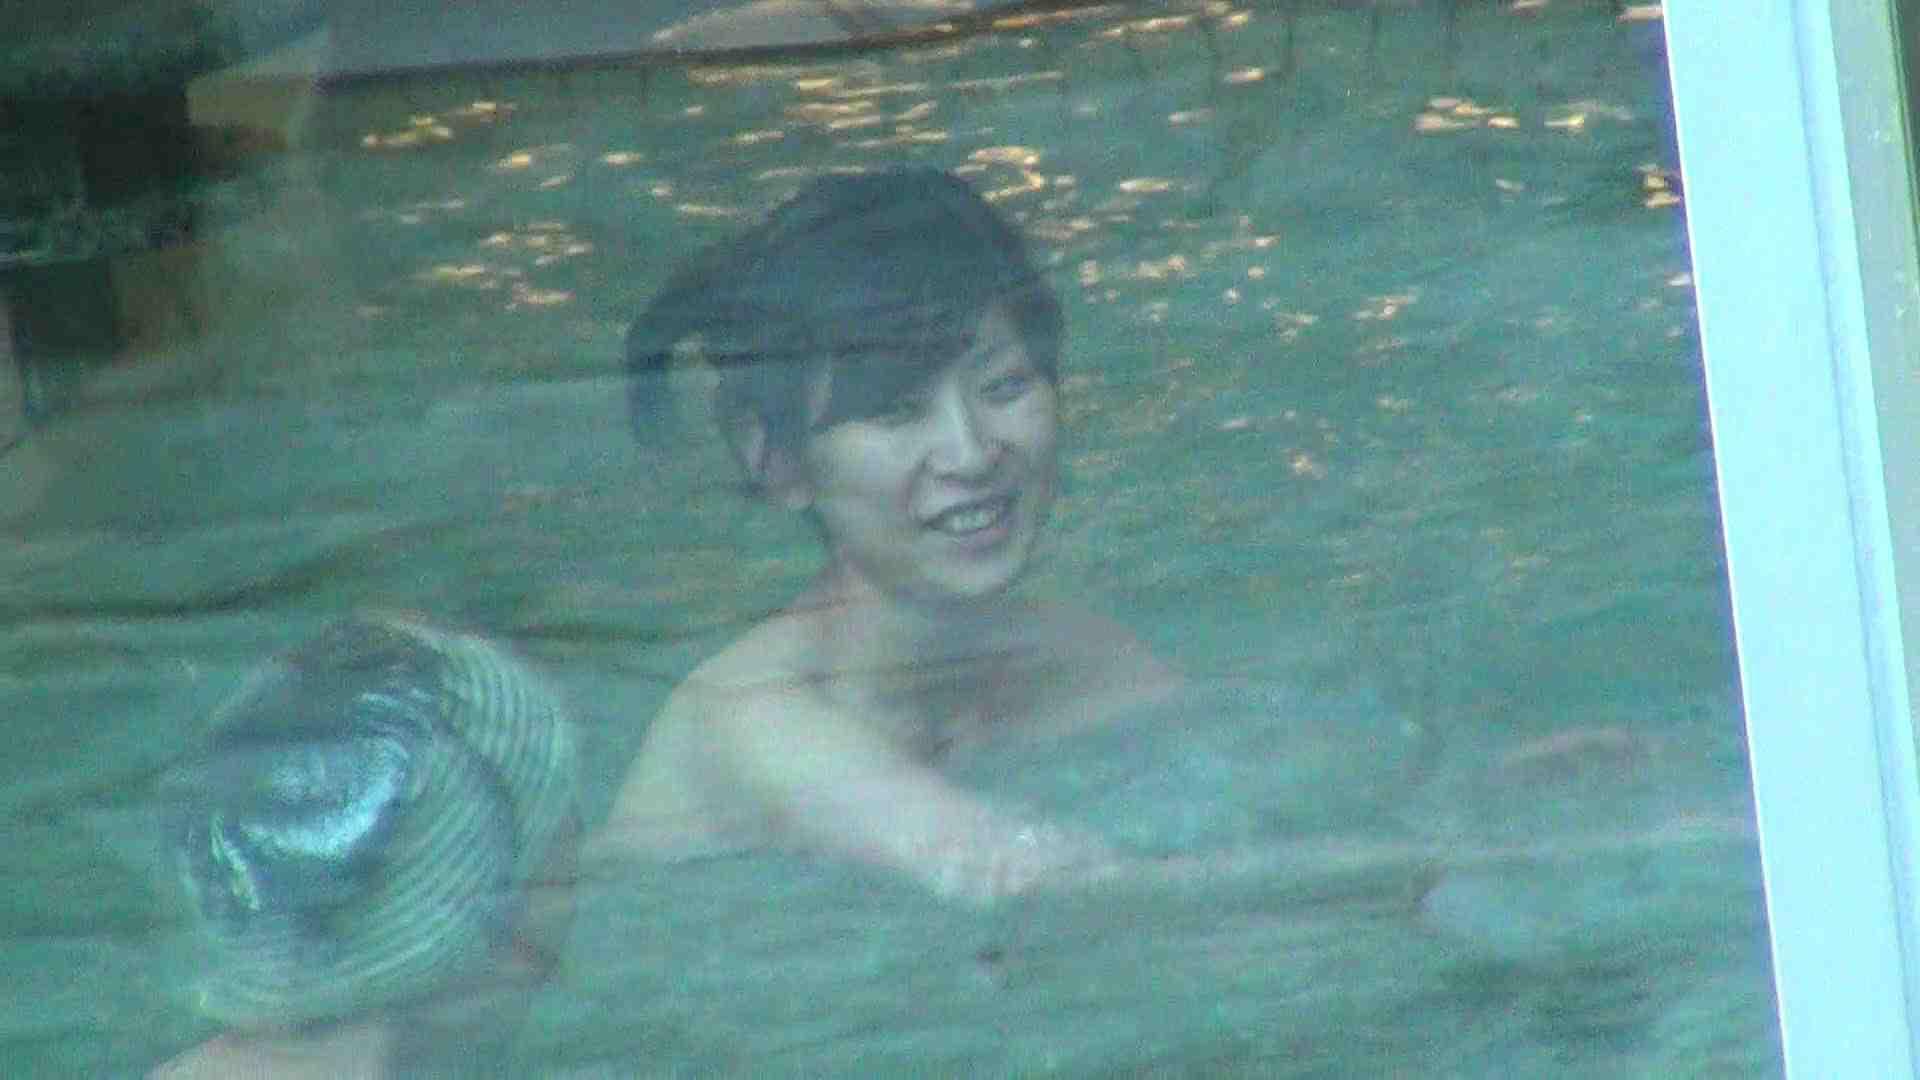 Aquaな露天風呂Vol.294 綺麗なOLたち  84枚 72